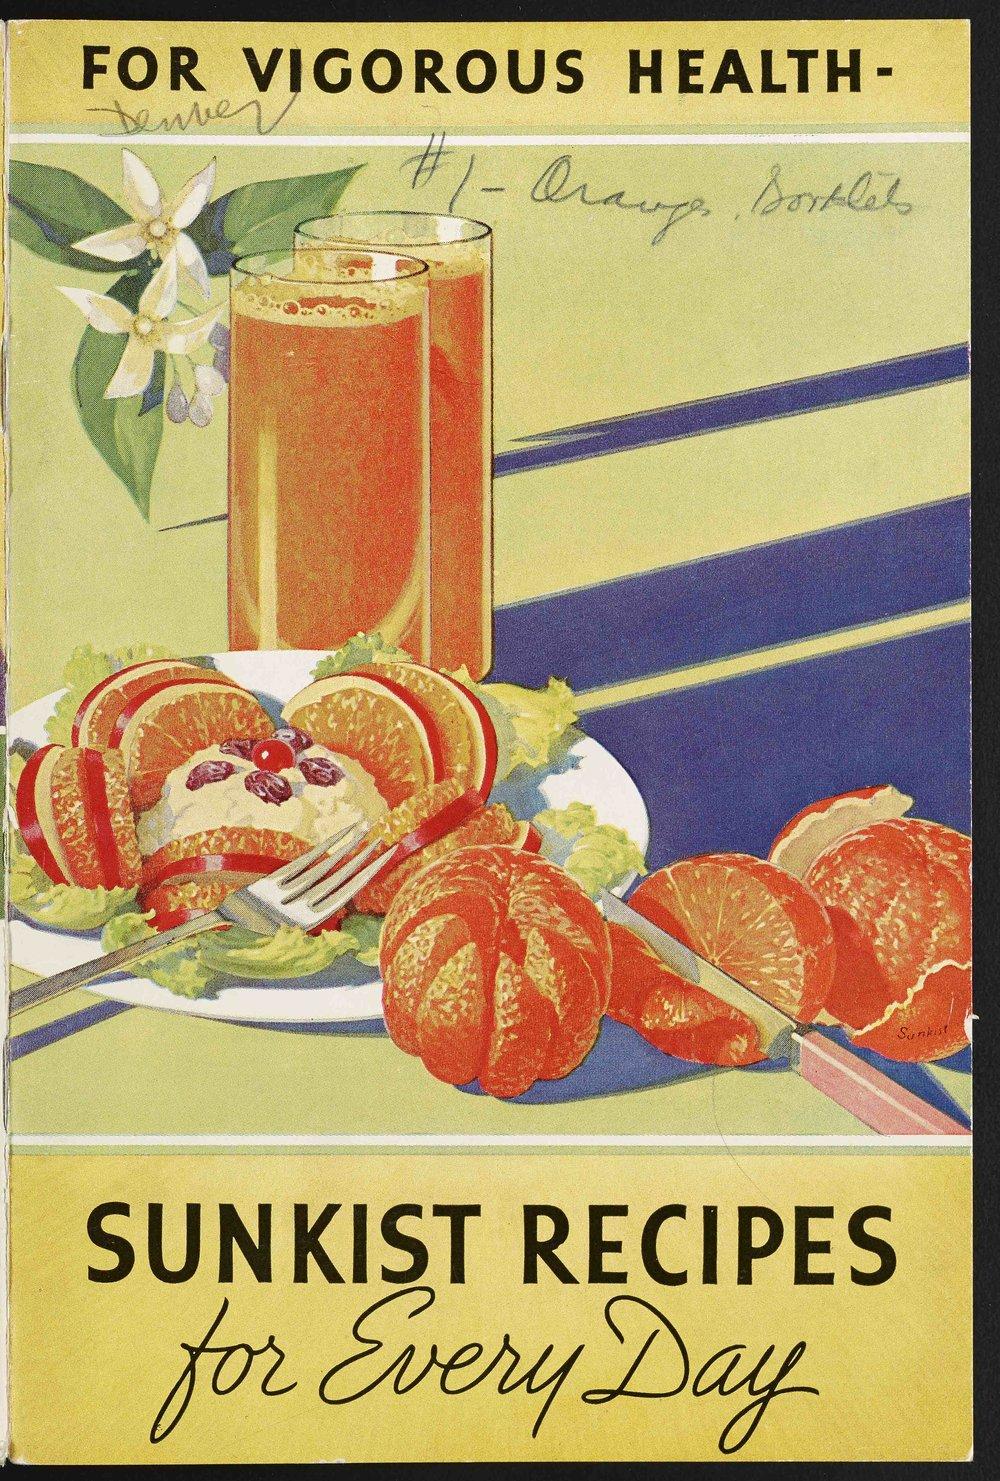 California Fruit Growers Exchange